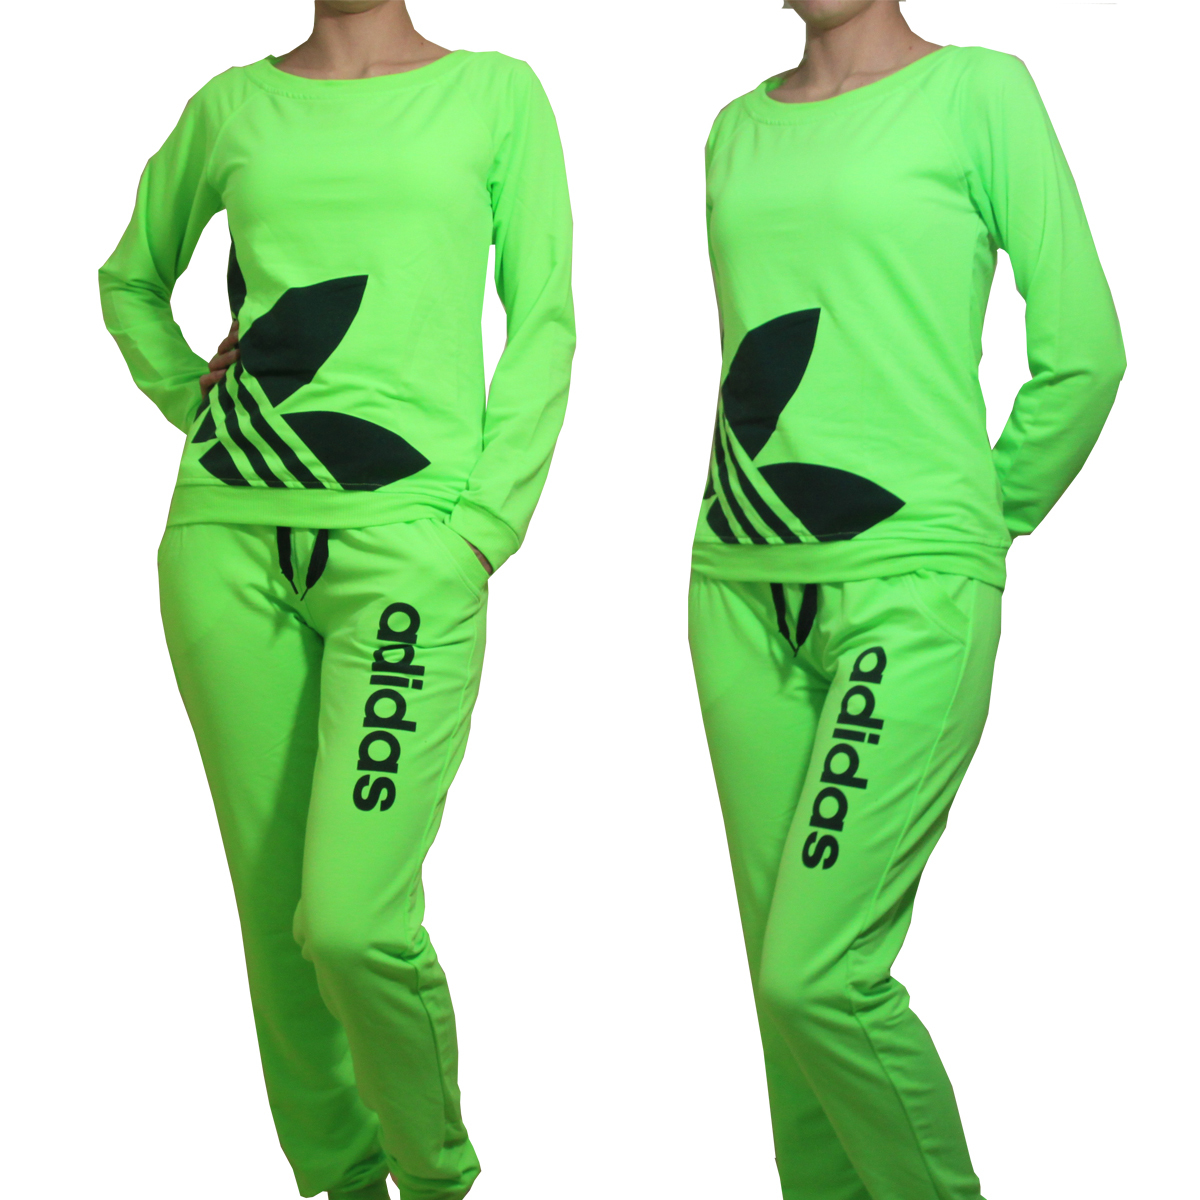 Adidas Neon Color Women Tracksuit Sweatsuit Neon GREEN - Athletic Apparel